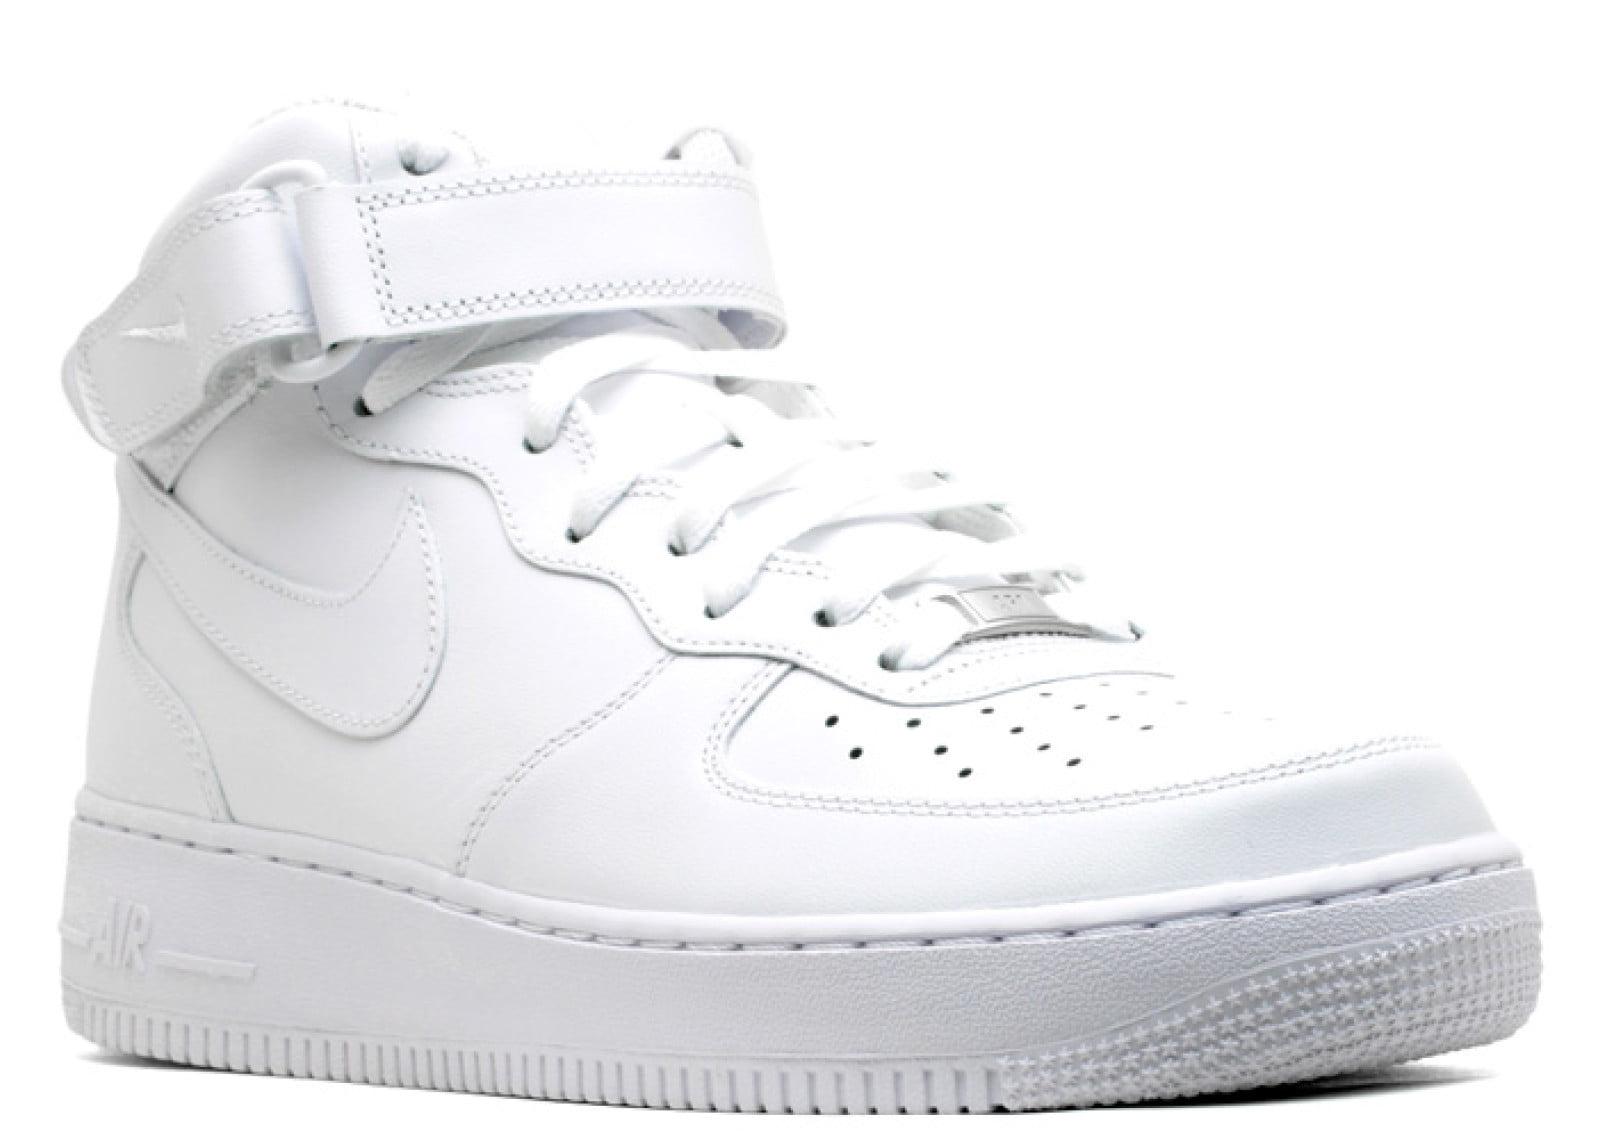 Nike - Men - Air Force 1 Mid 07